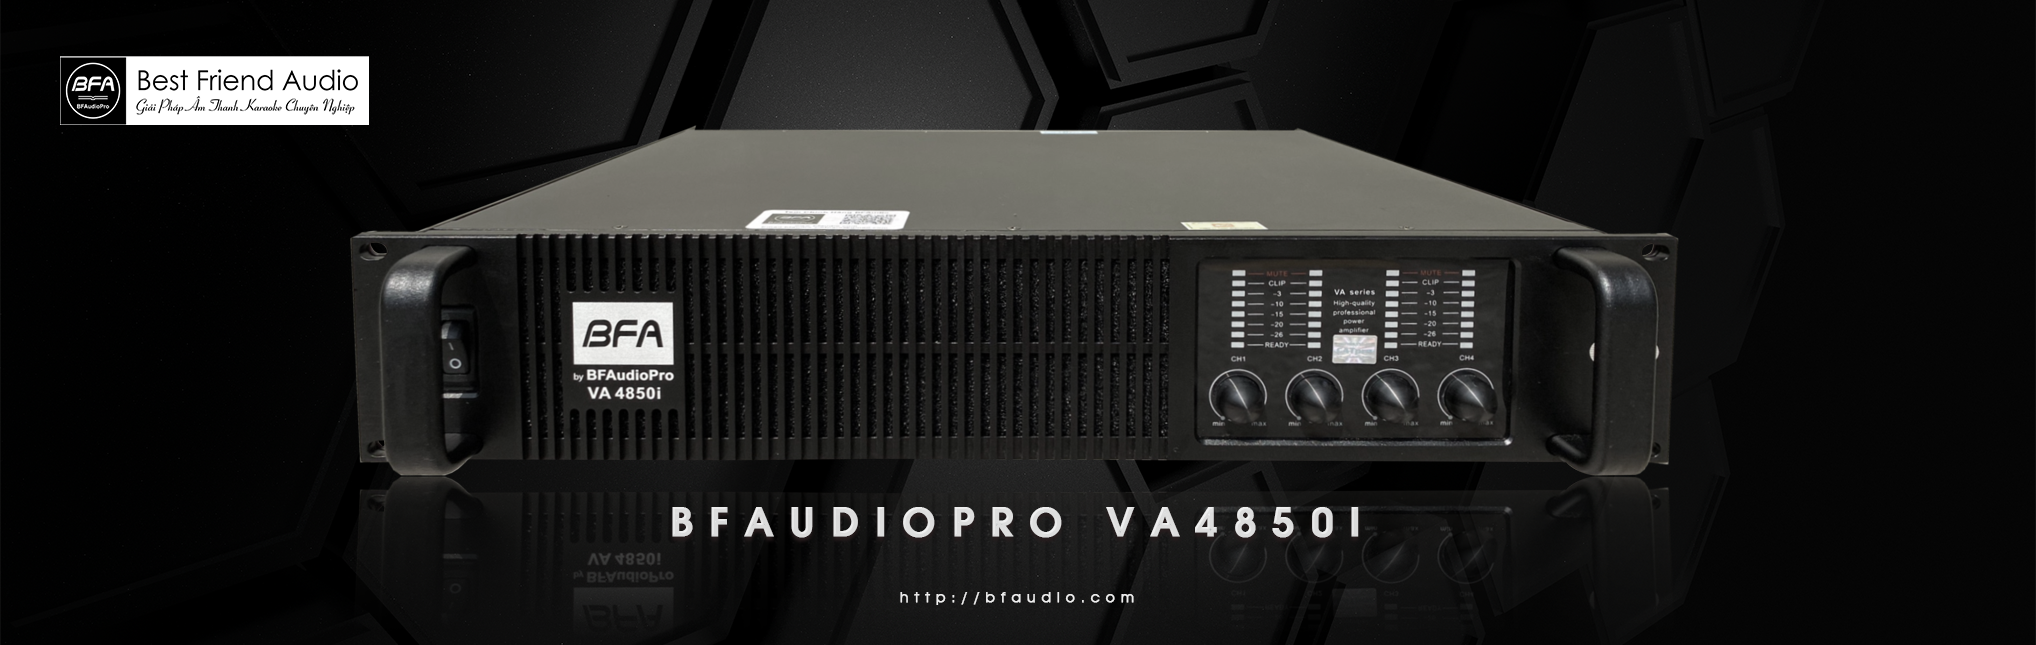 VA4850i